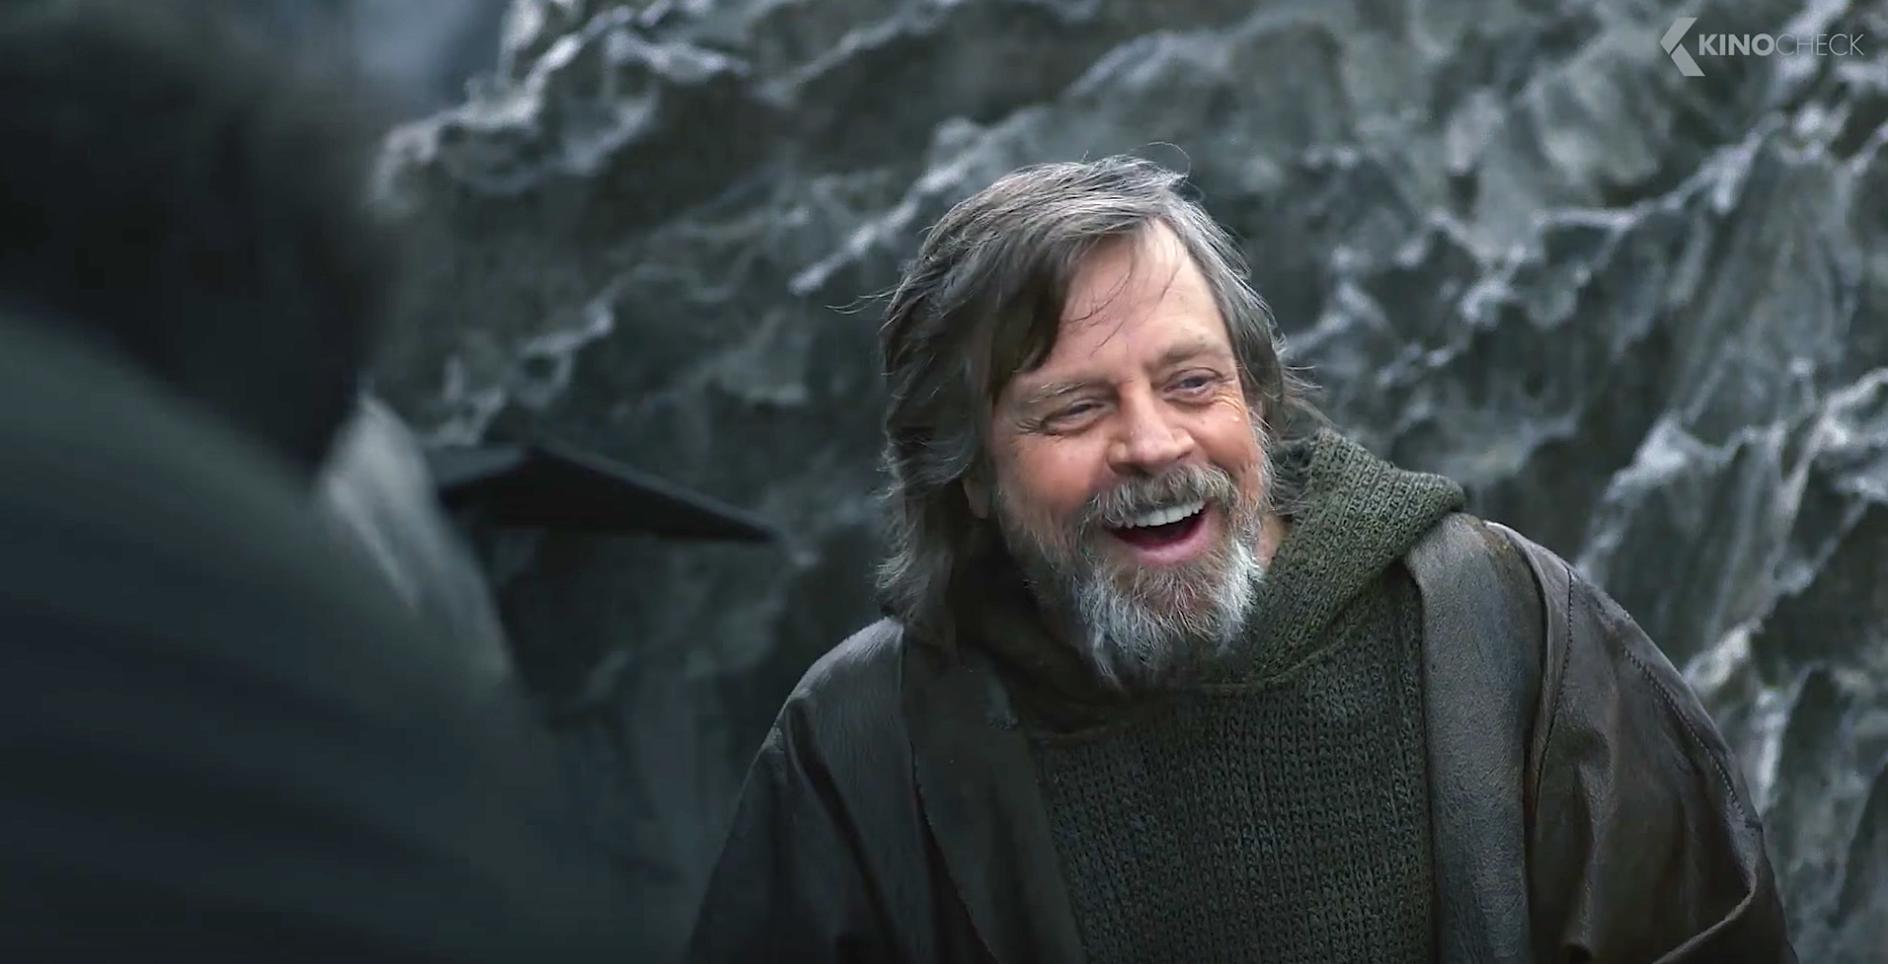 Confirmed: Luke Skywalker Fucks